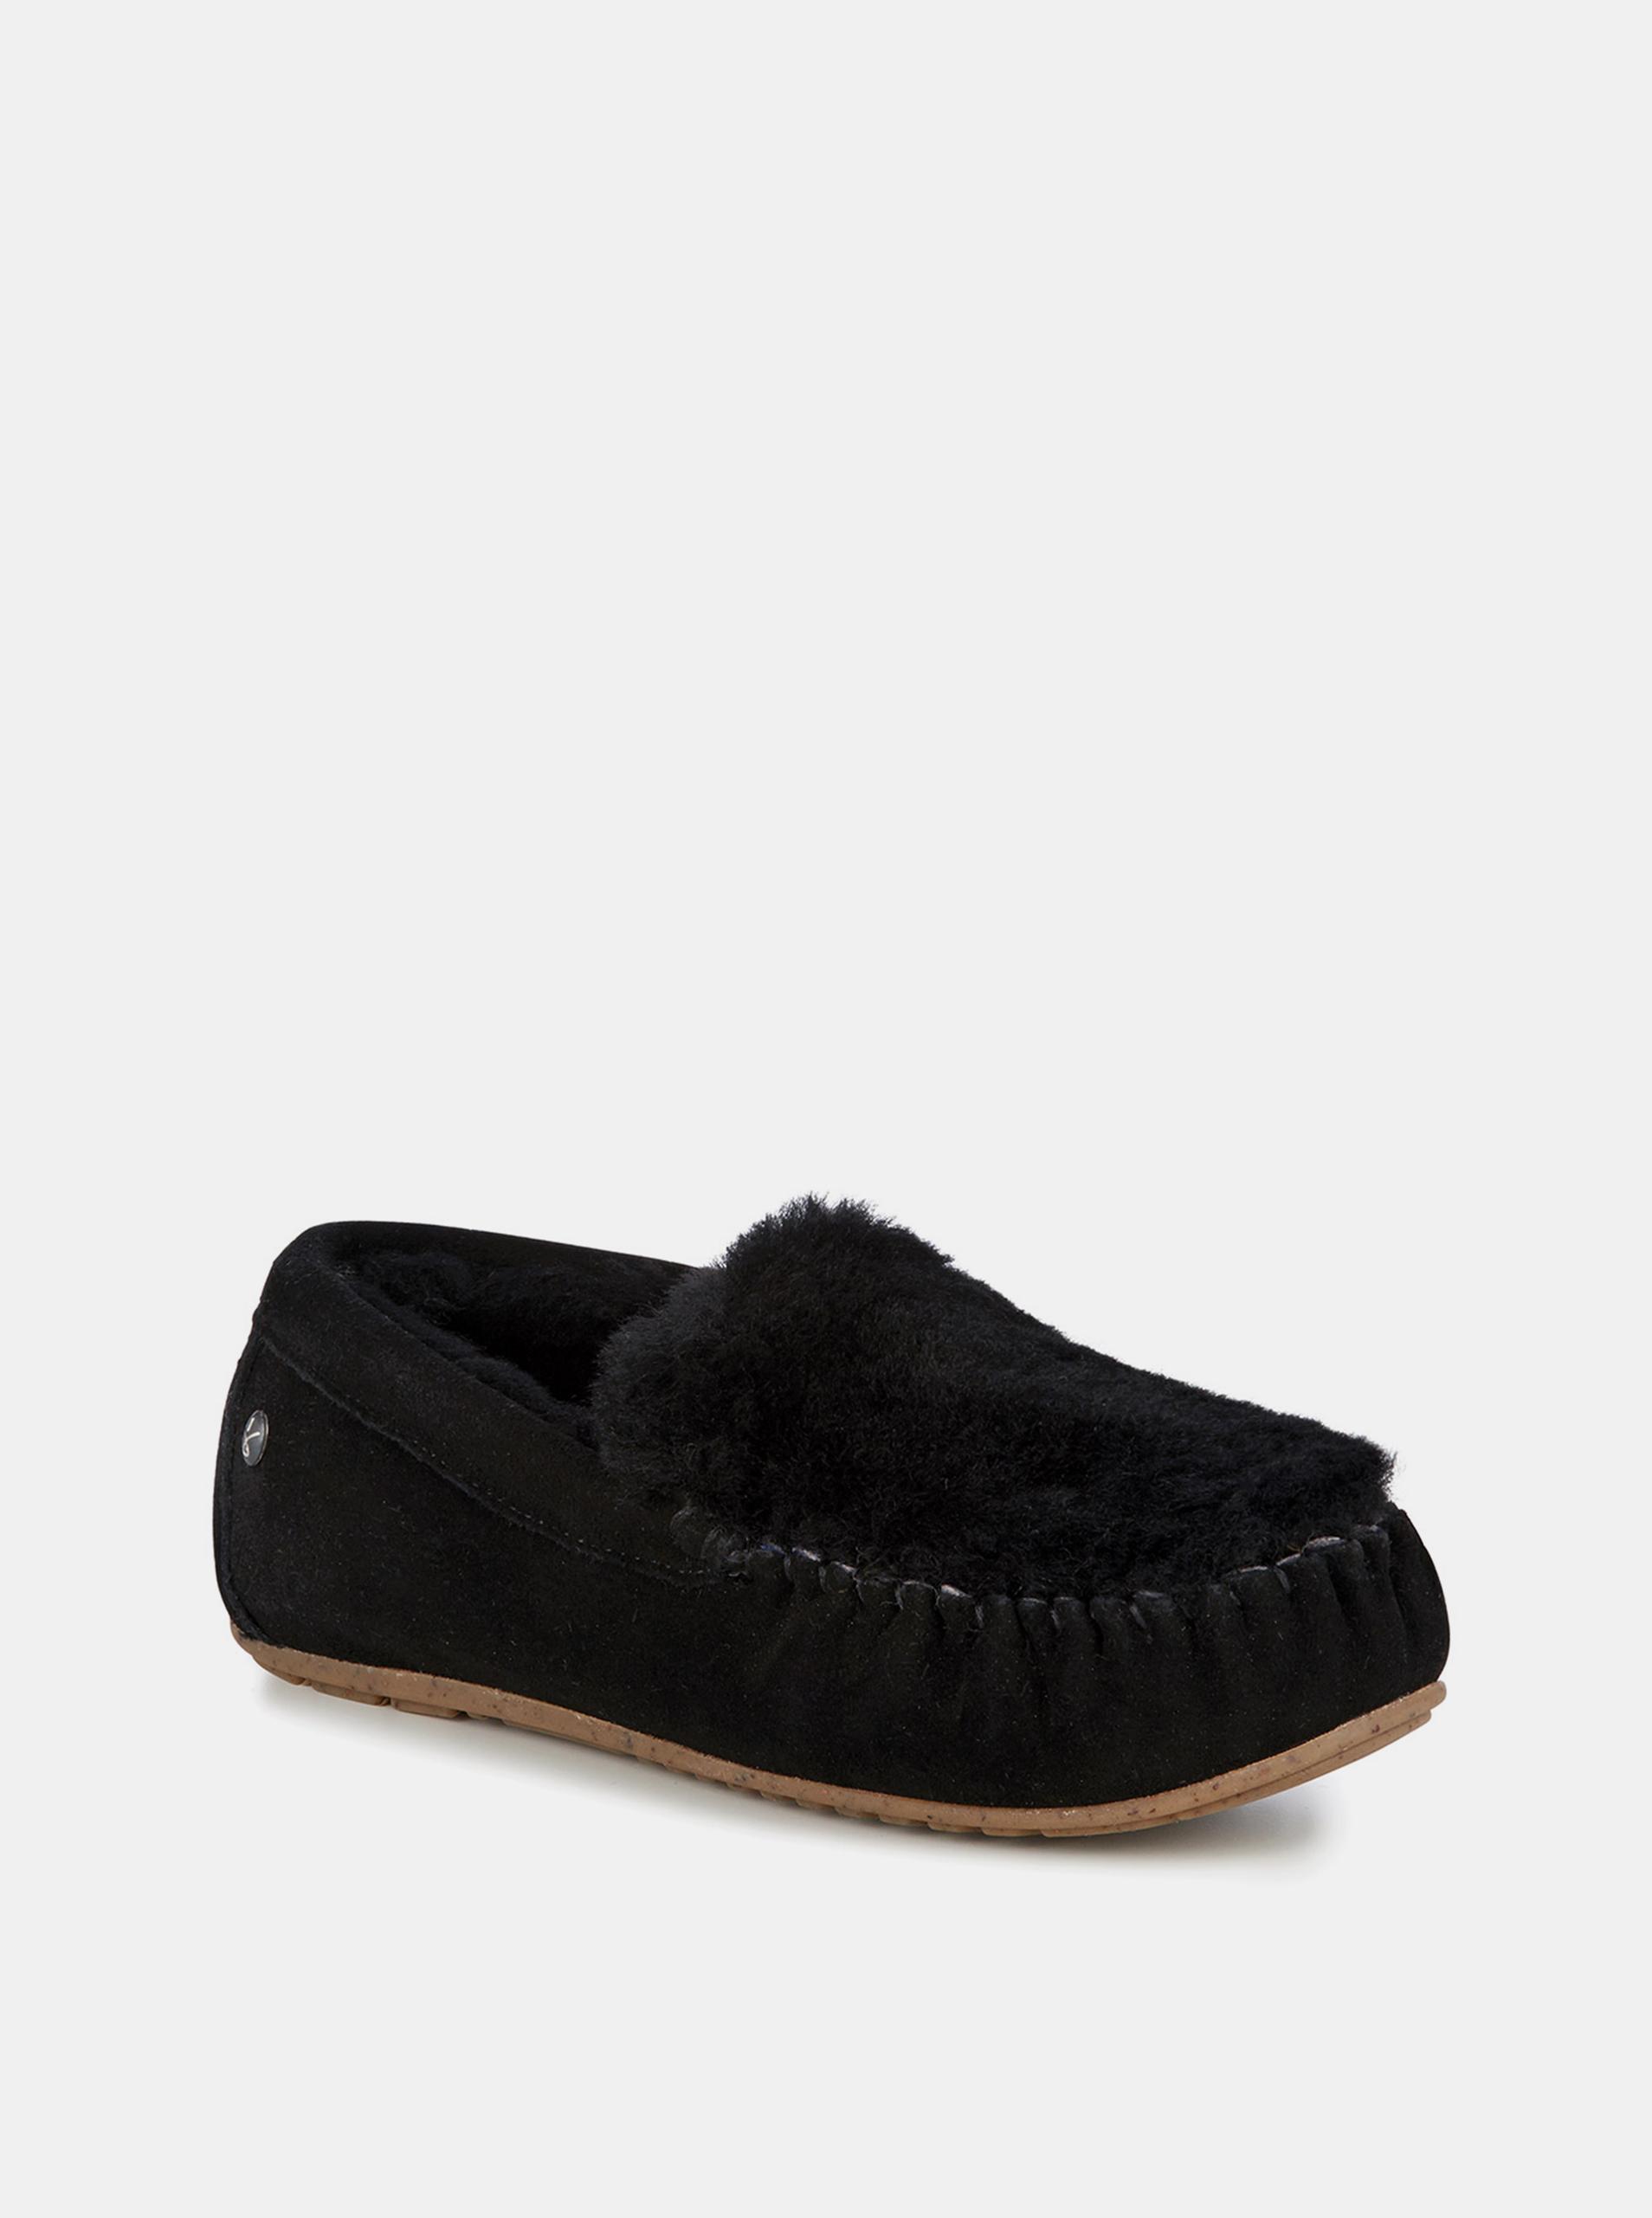 2c4896bf74 Emu čierne jesenné mokasíny Cairns Reerse Fur Black Noir - Dámske ...